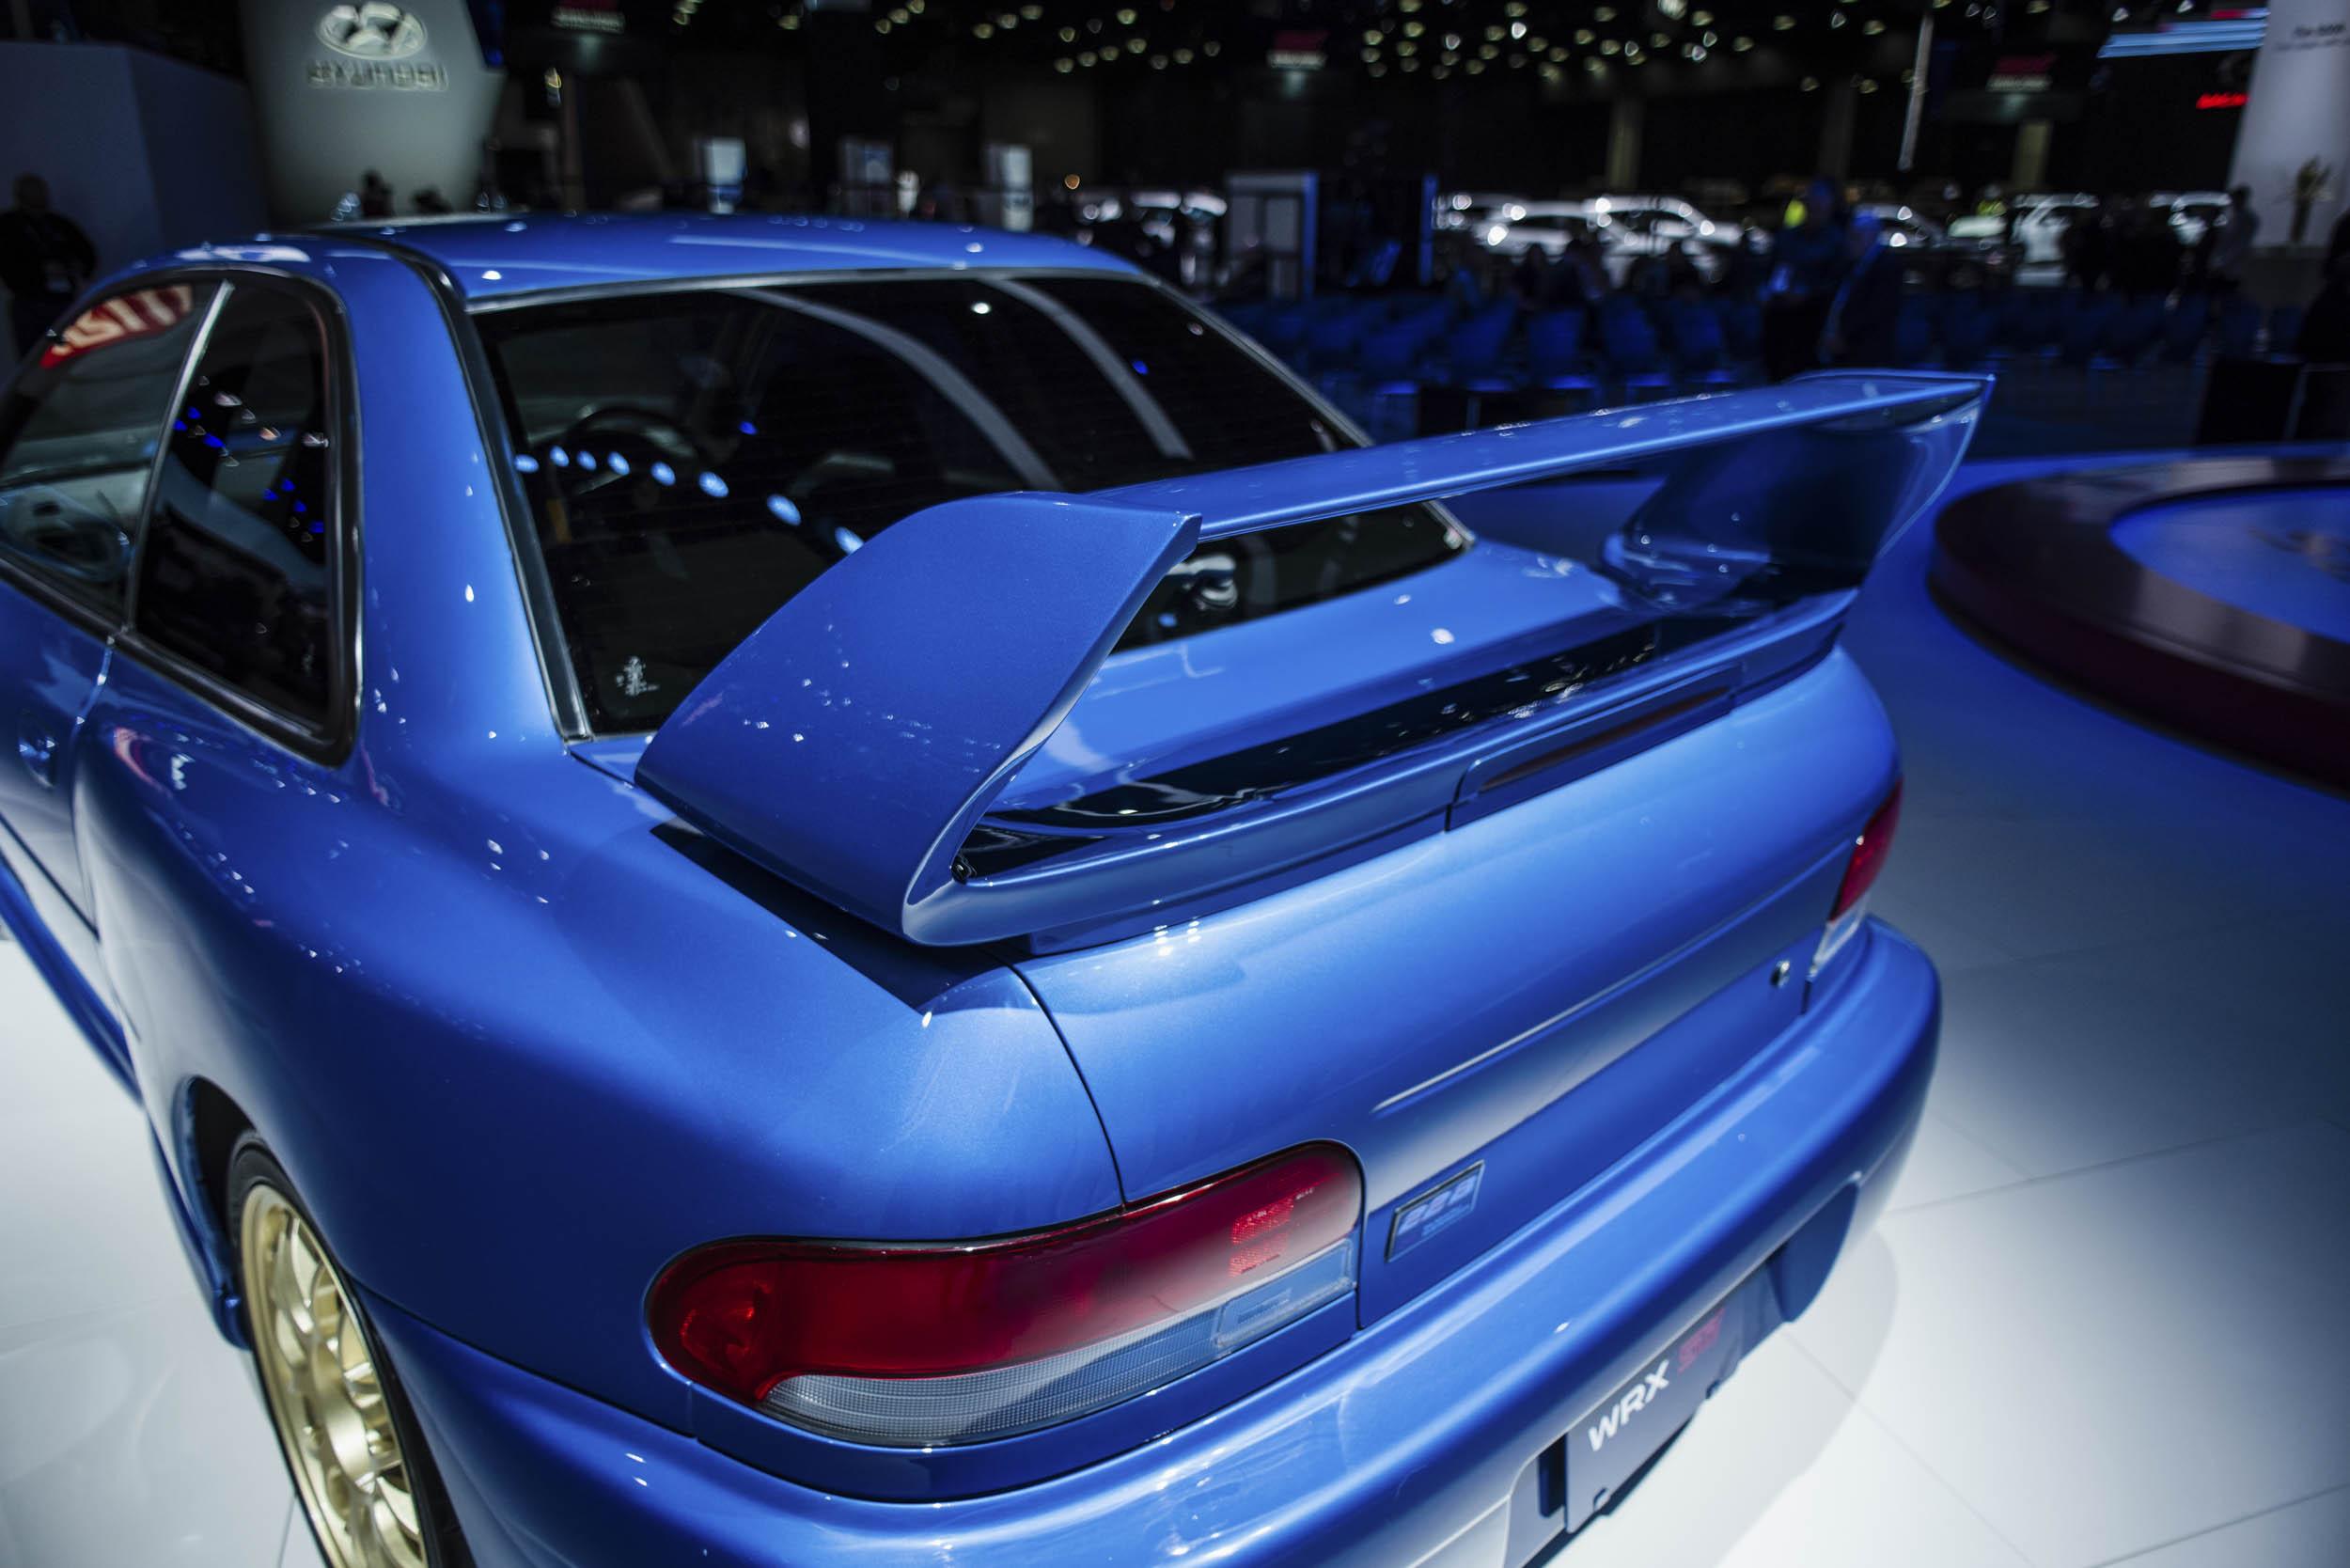 1998 Subaru 22B wing